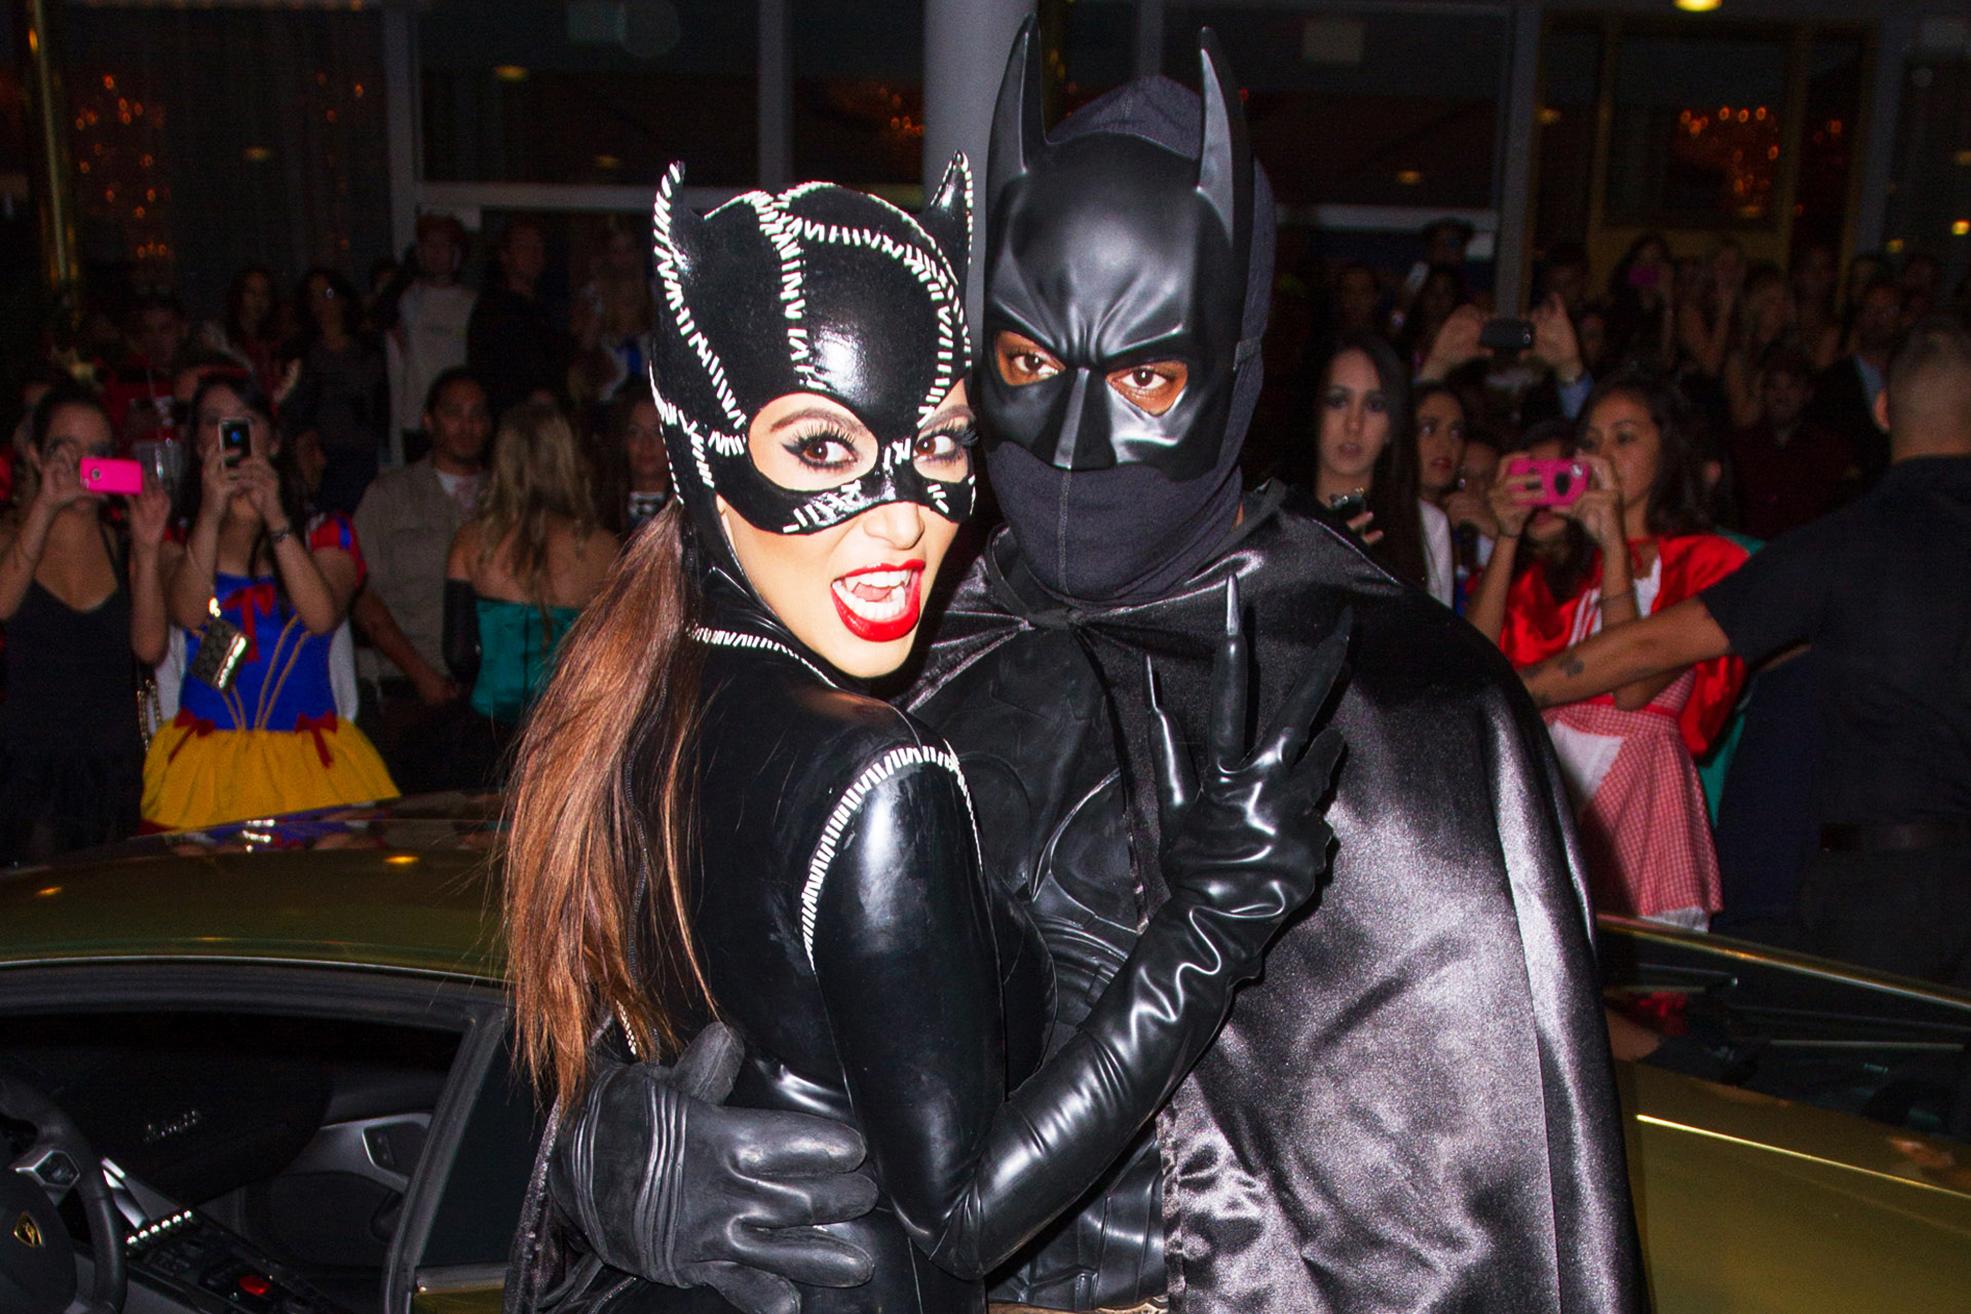 Kim Kardashian and Kanye West arrive at Kim Kardashian's Halloween party in Miami Beach, Fla., on Oct. 31, 2012.